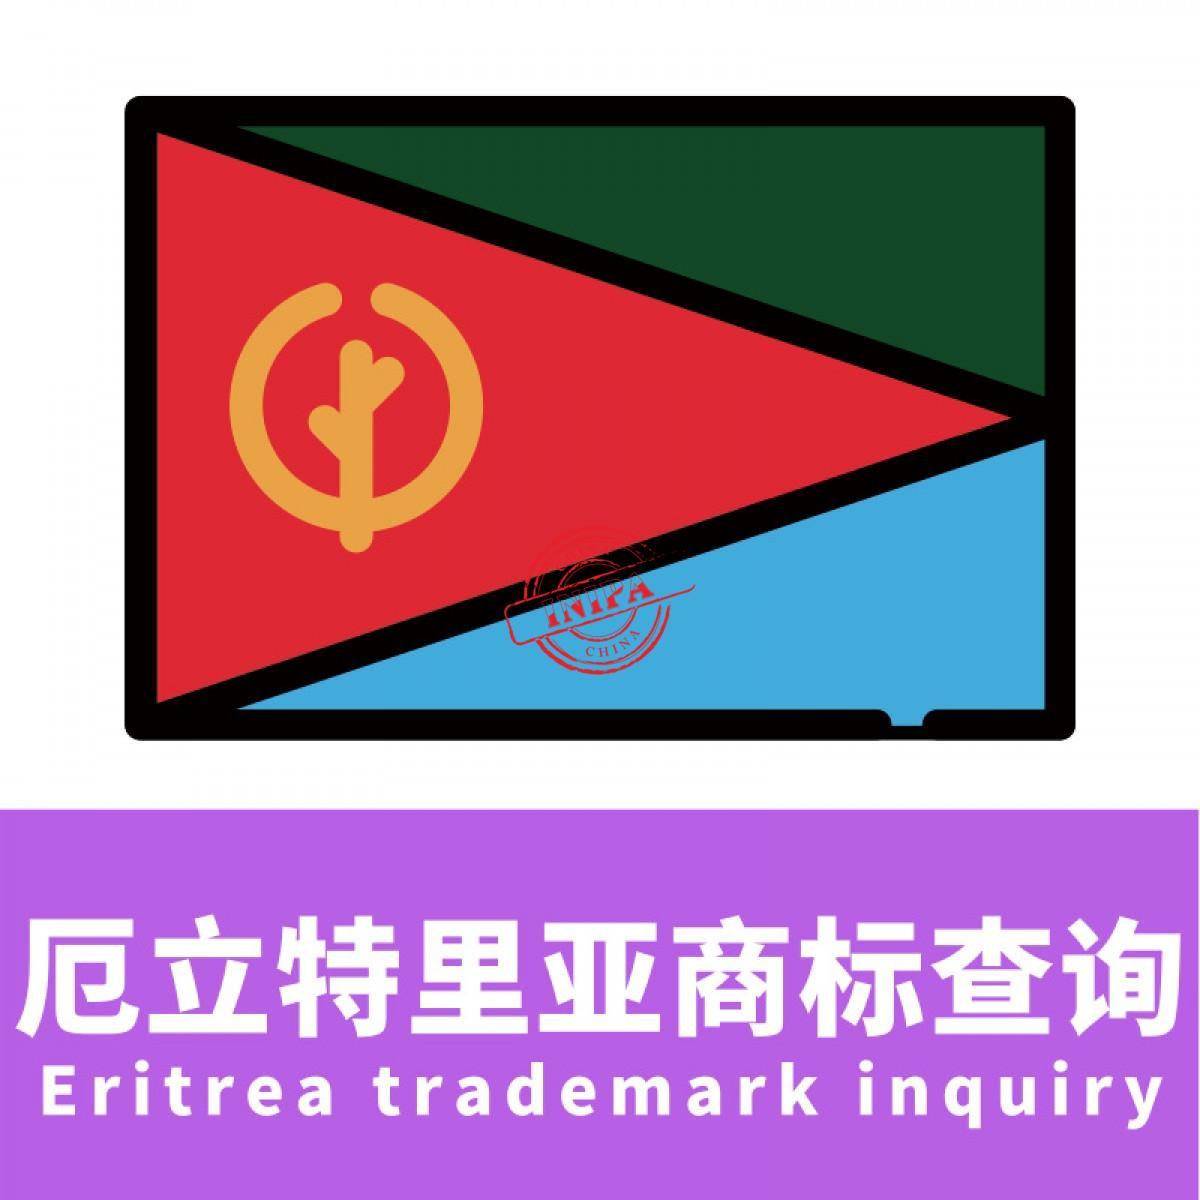 厄立特里亚商标查询/Eritrea trademark inquiry